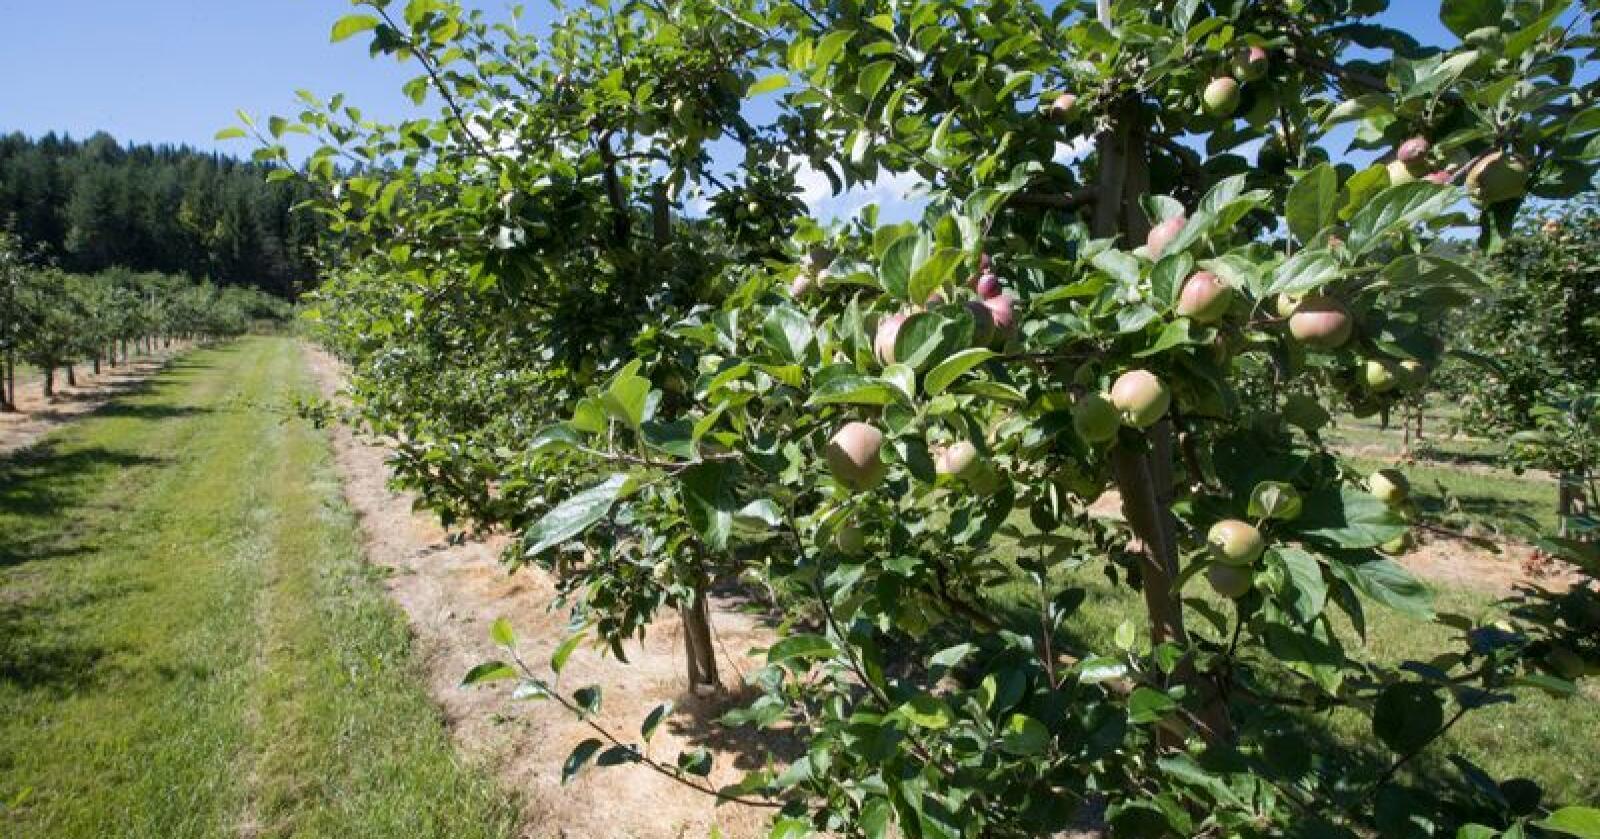 Dyrking av epler langs Eikeren I Øvre Eiker kommune. Arkivfoto: Terje Bendiksby / NTB scanpix